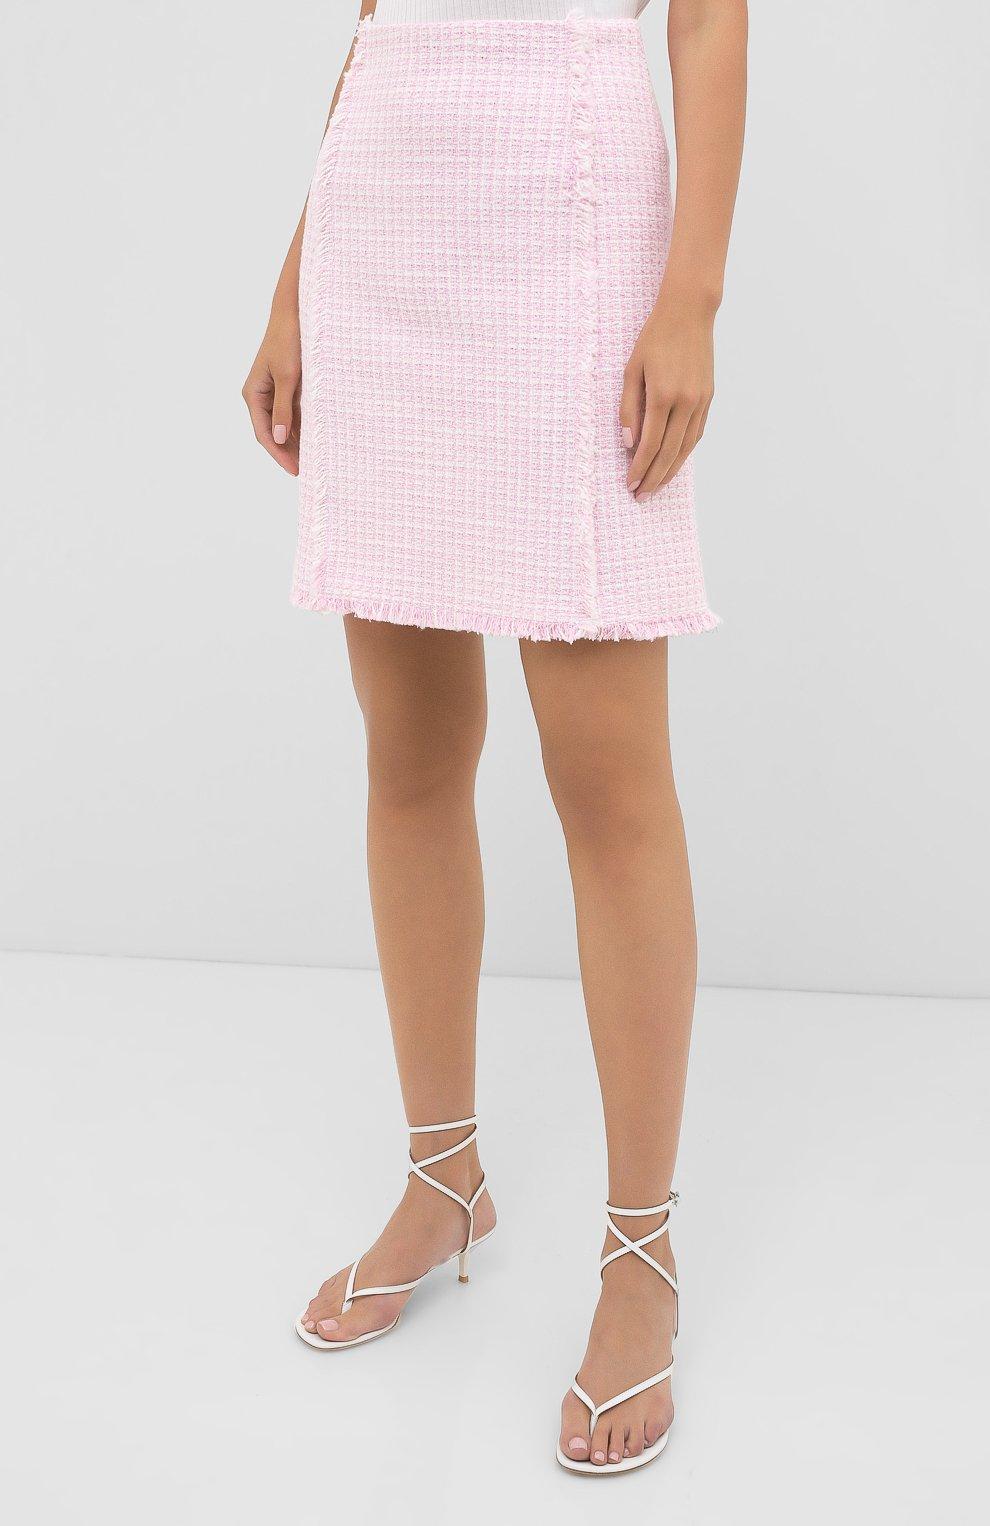 Женская юбка BOSS розового цвета, арт. 50434552 | Фото 3